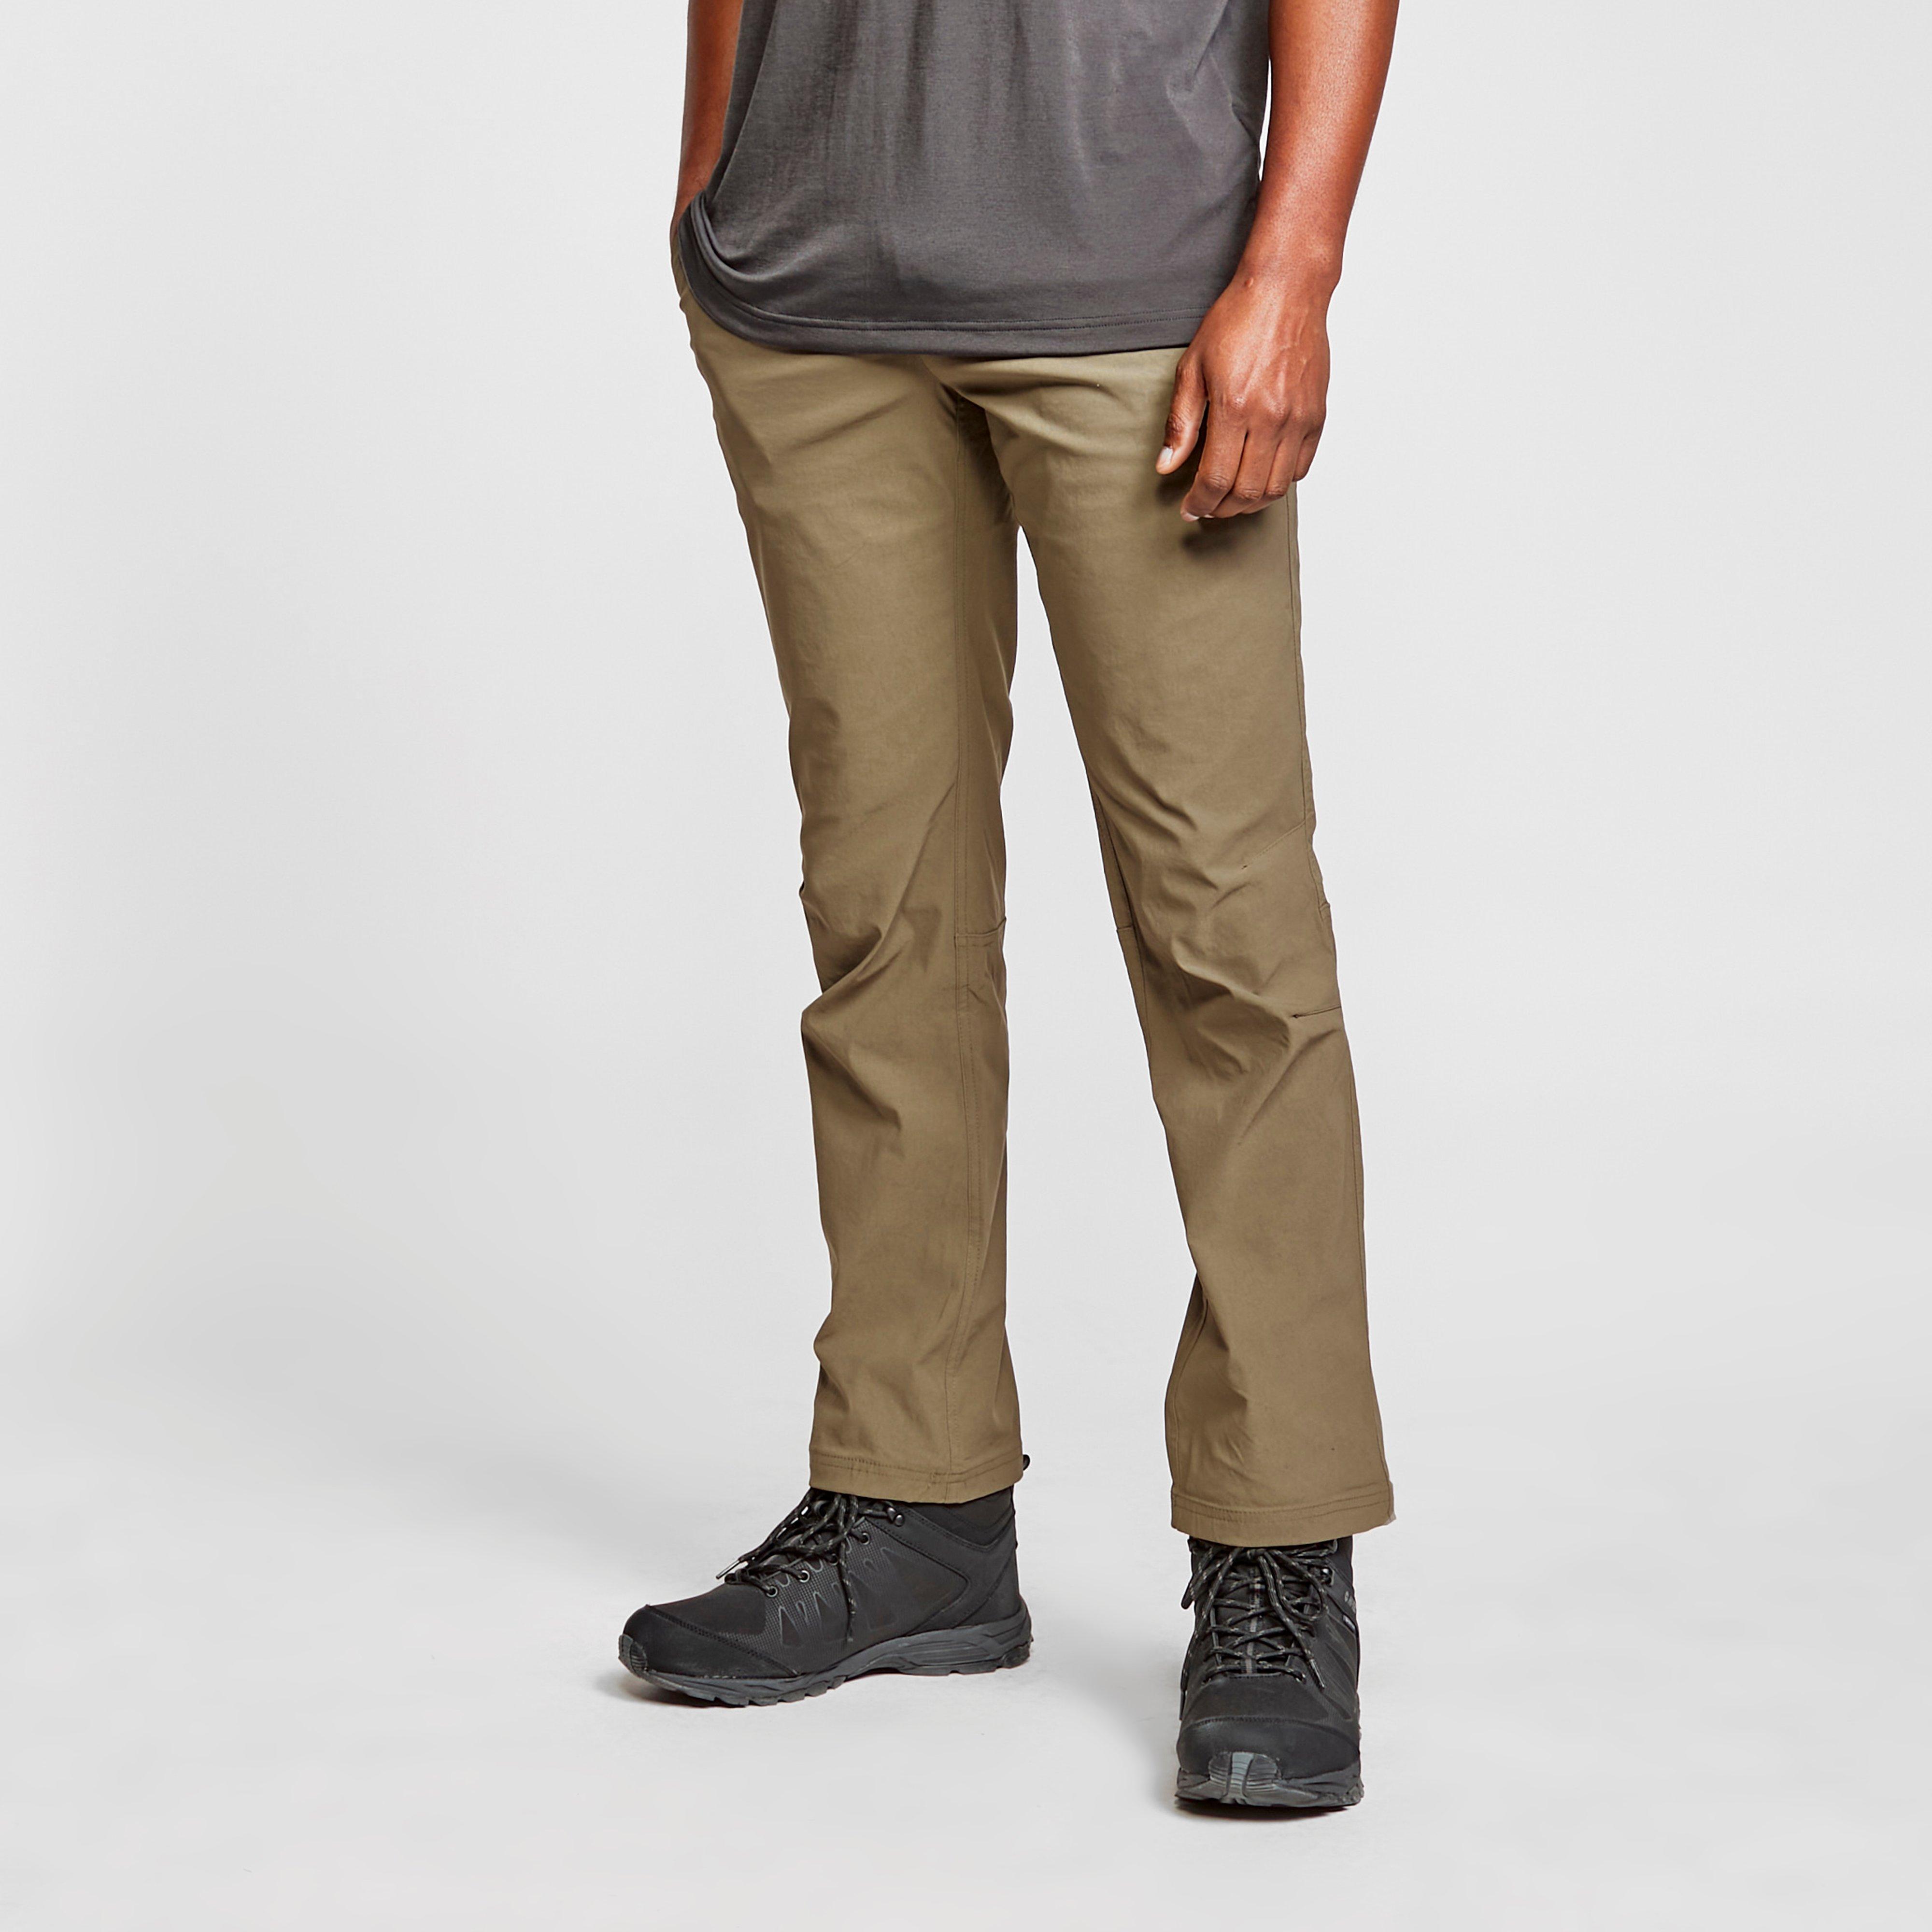 Brasher Brasher Mens Stretch Trousers - Khaki, Khaki